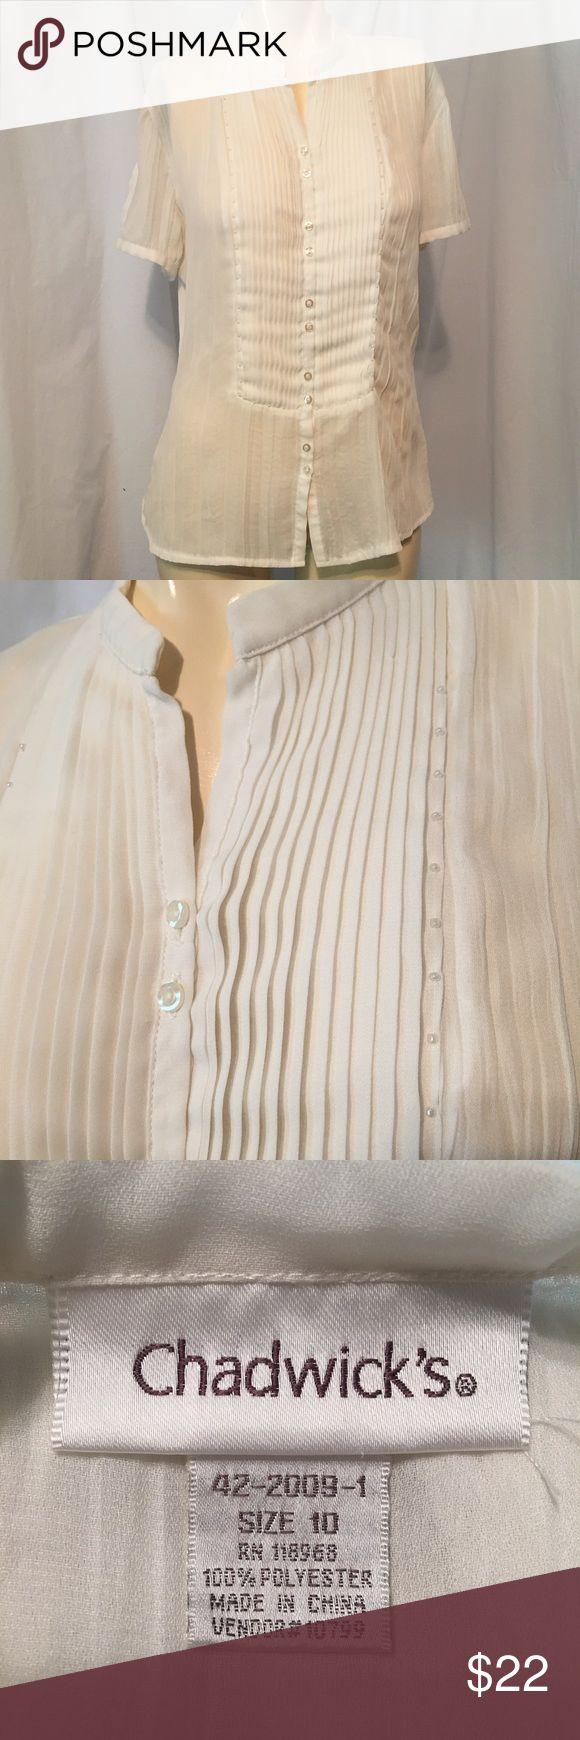 Chadwick's ruffle beaded top Off white ruffle button down top Chadwicks Tops